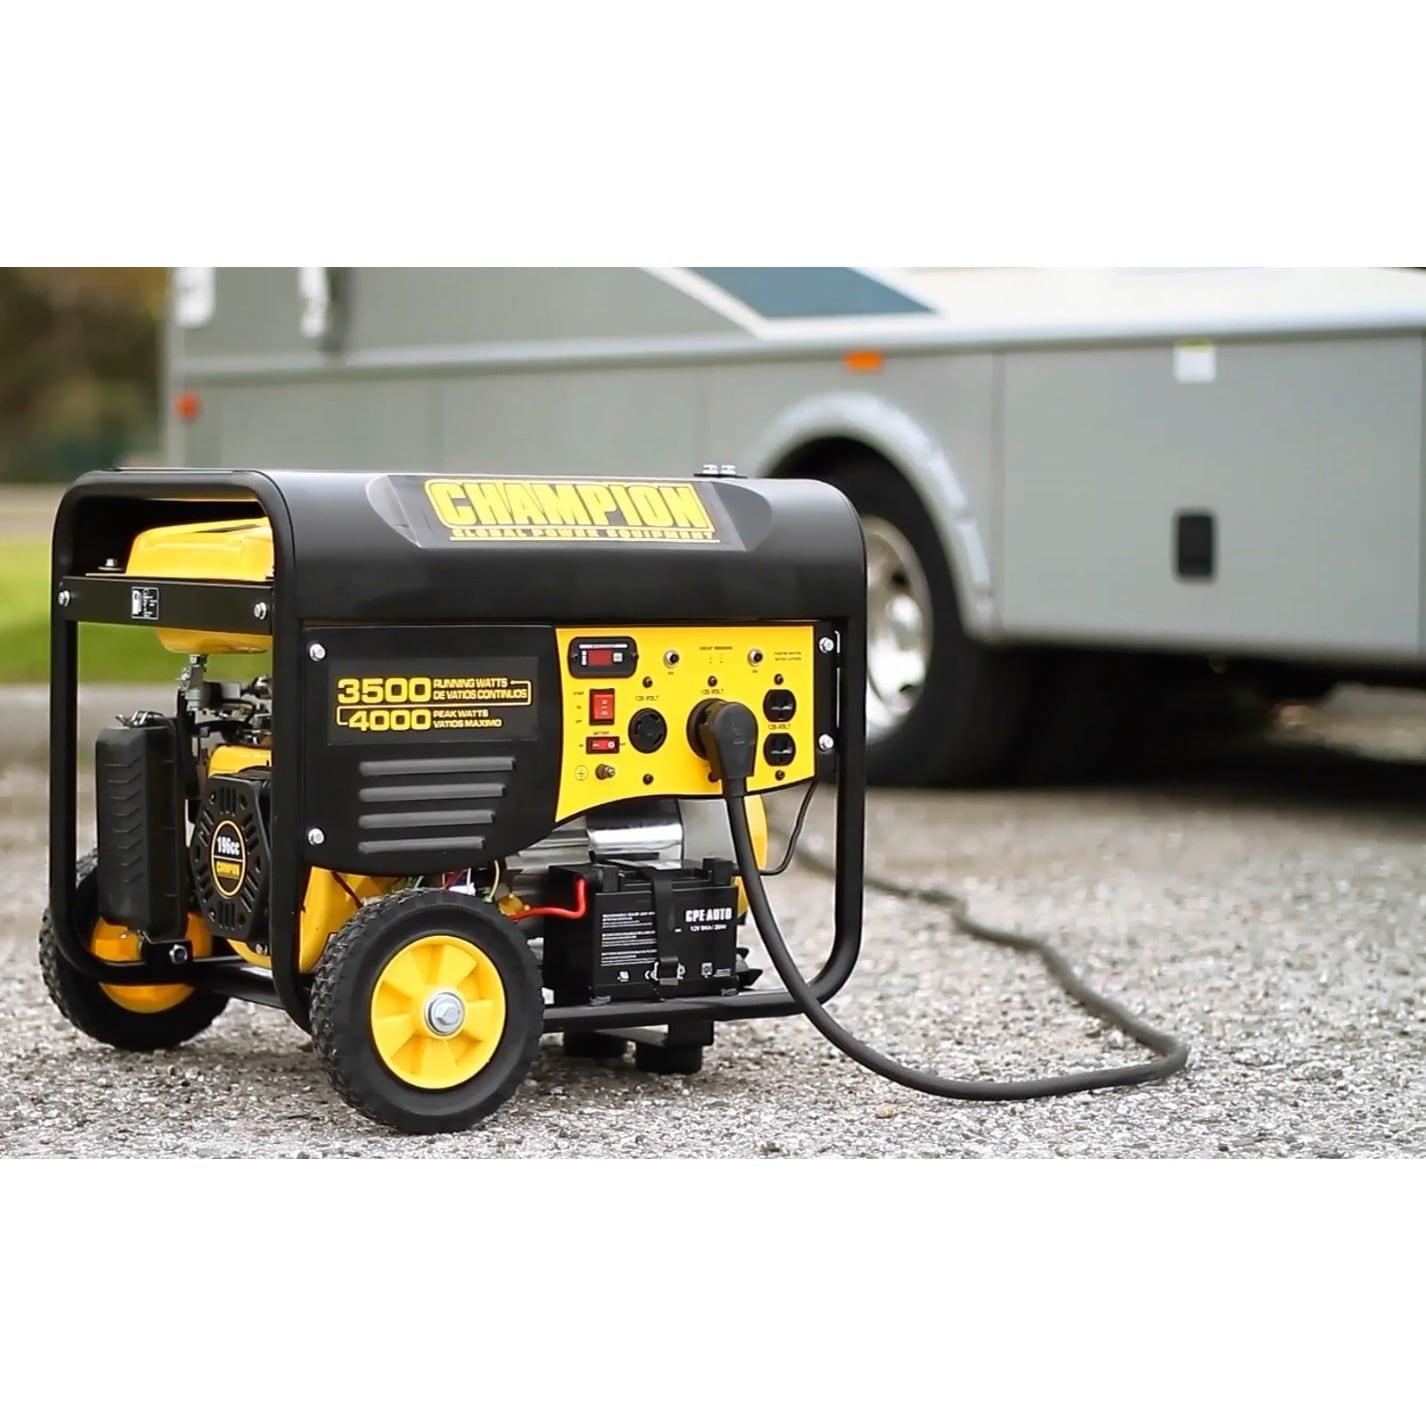 Champion Power Equipment Portable 3 500 Watt Generator with